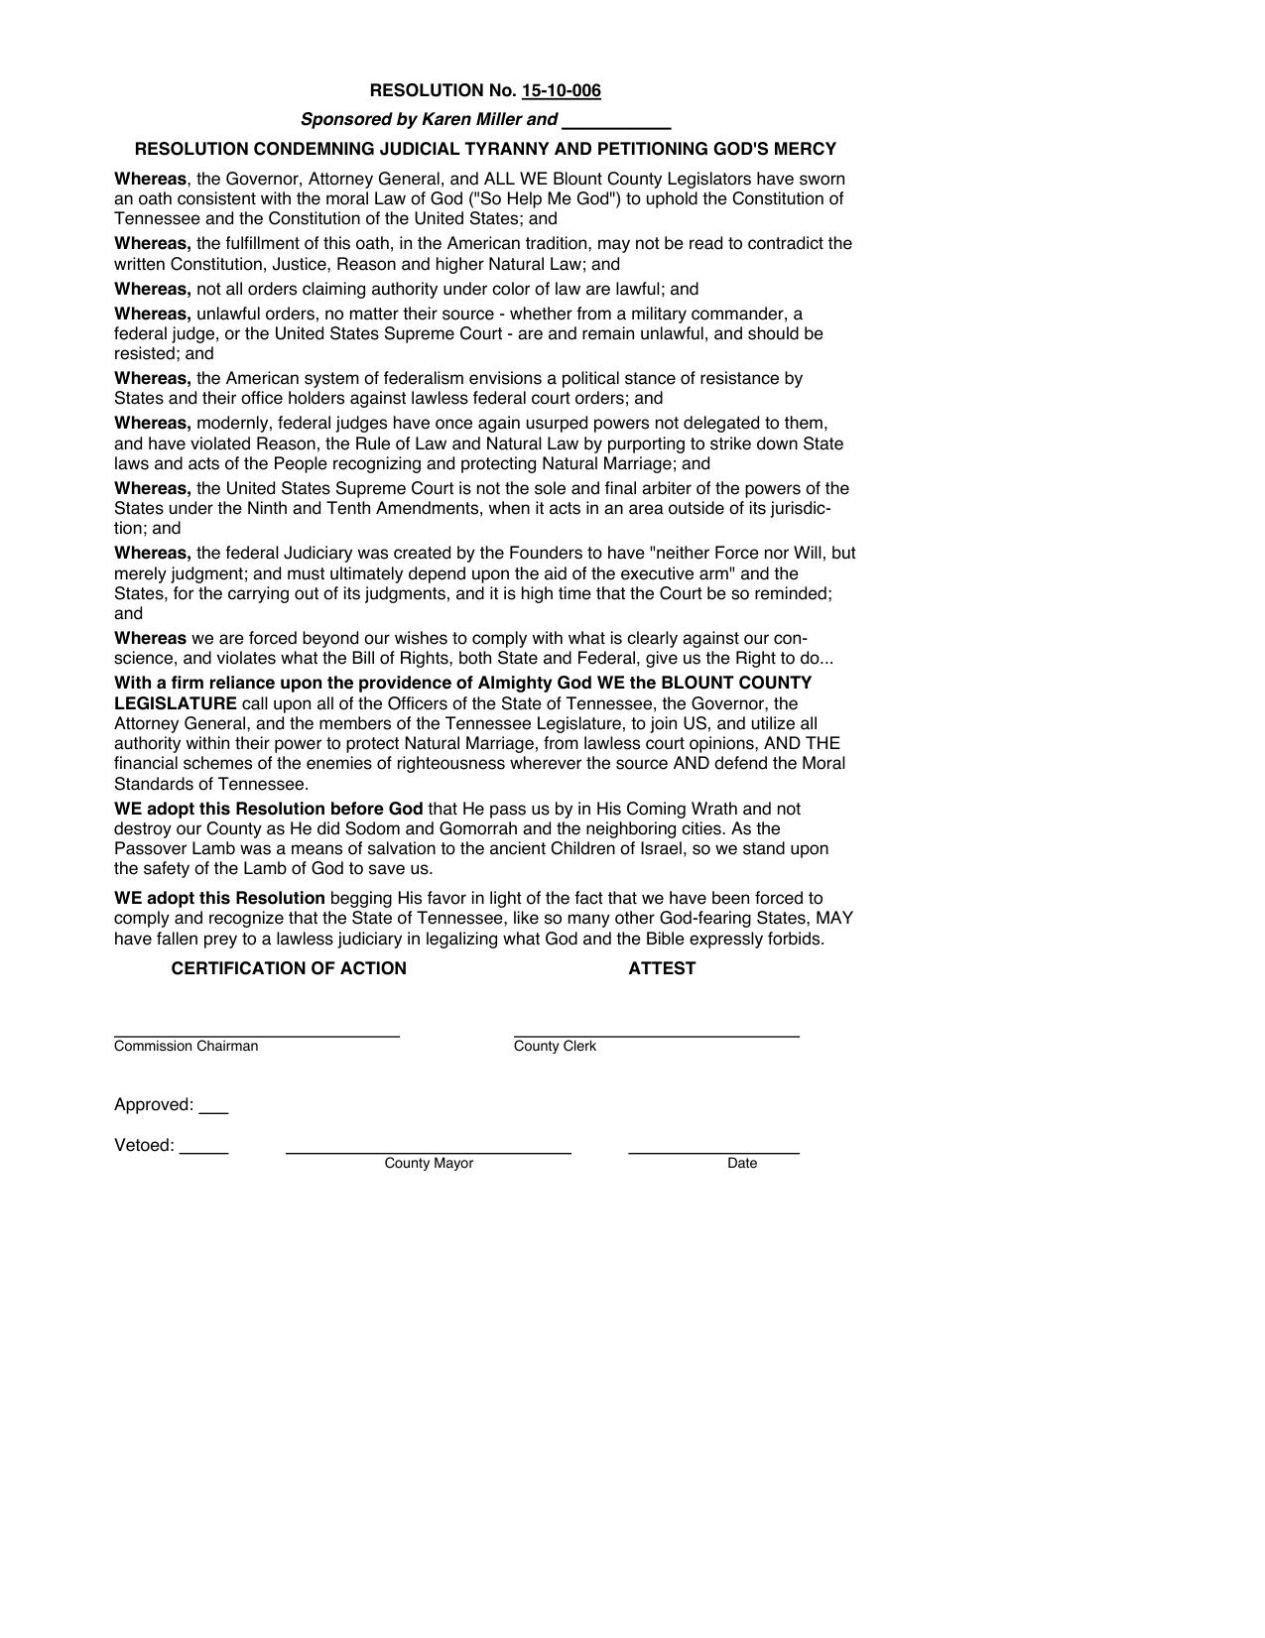 Karen Miller resolution petitioning God's mercy